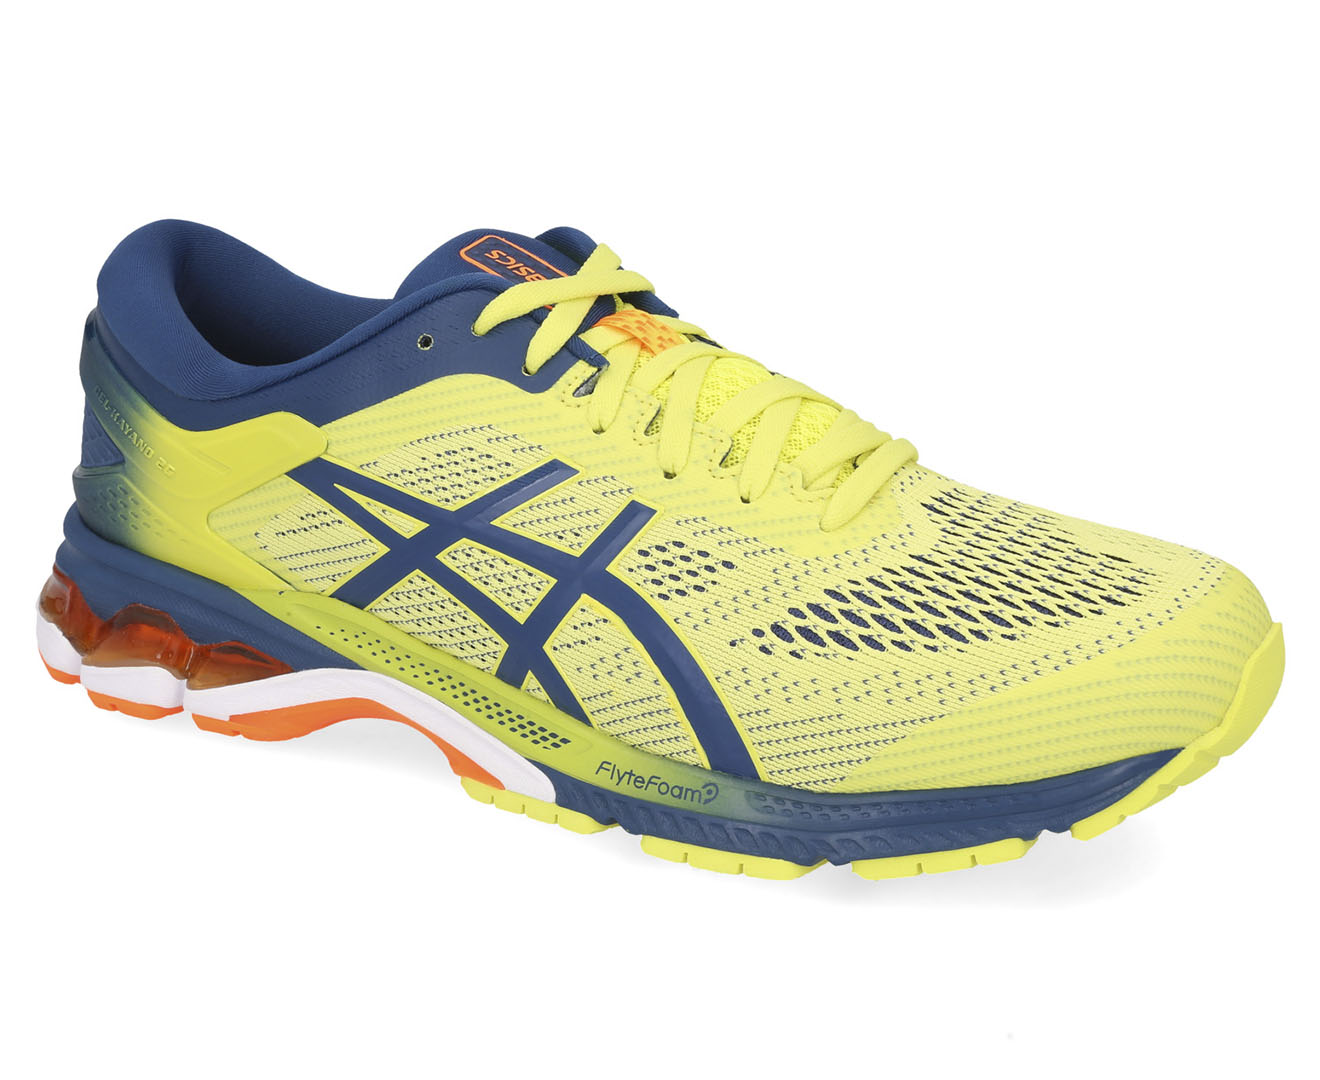 portátil Evaluación bruja  asics gel kayano 26 kai men's shoes sour yuzu/mako blue | Sale OFF-65%